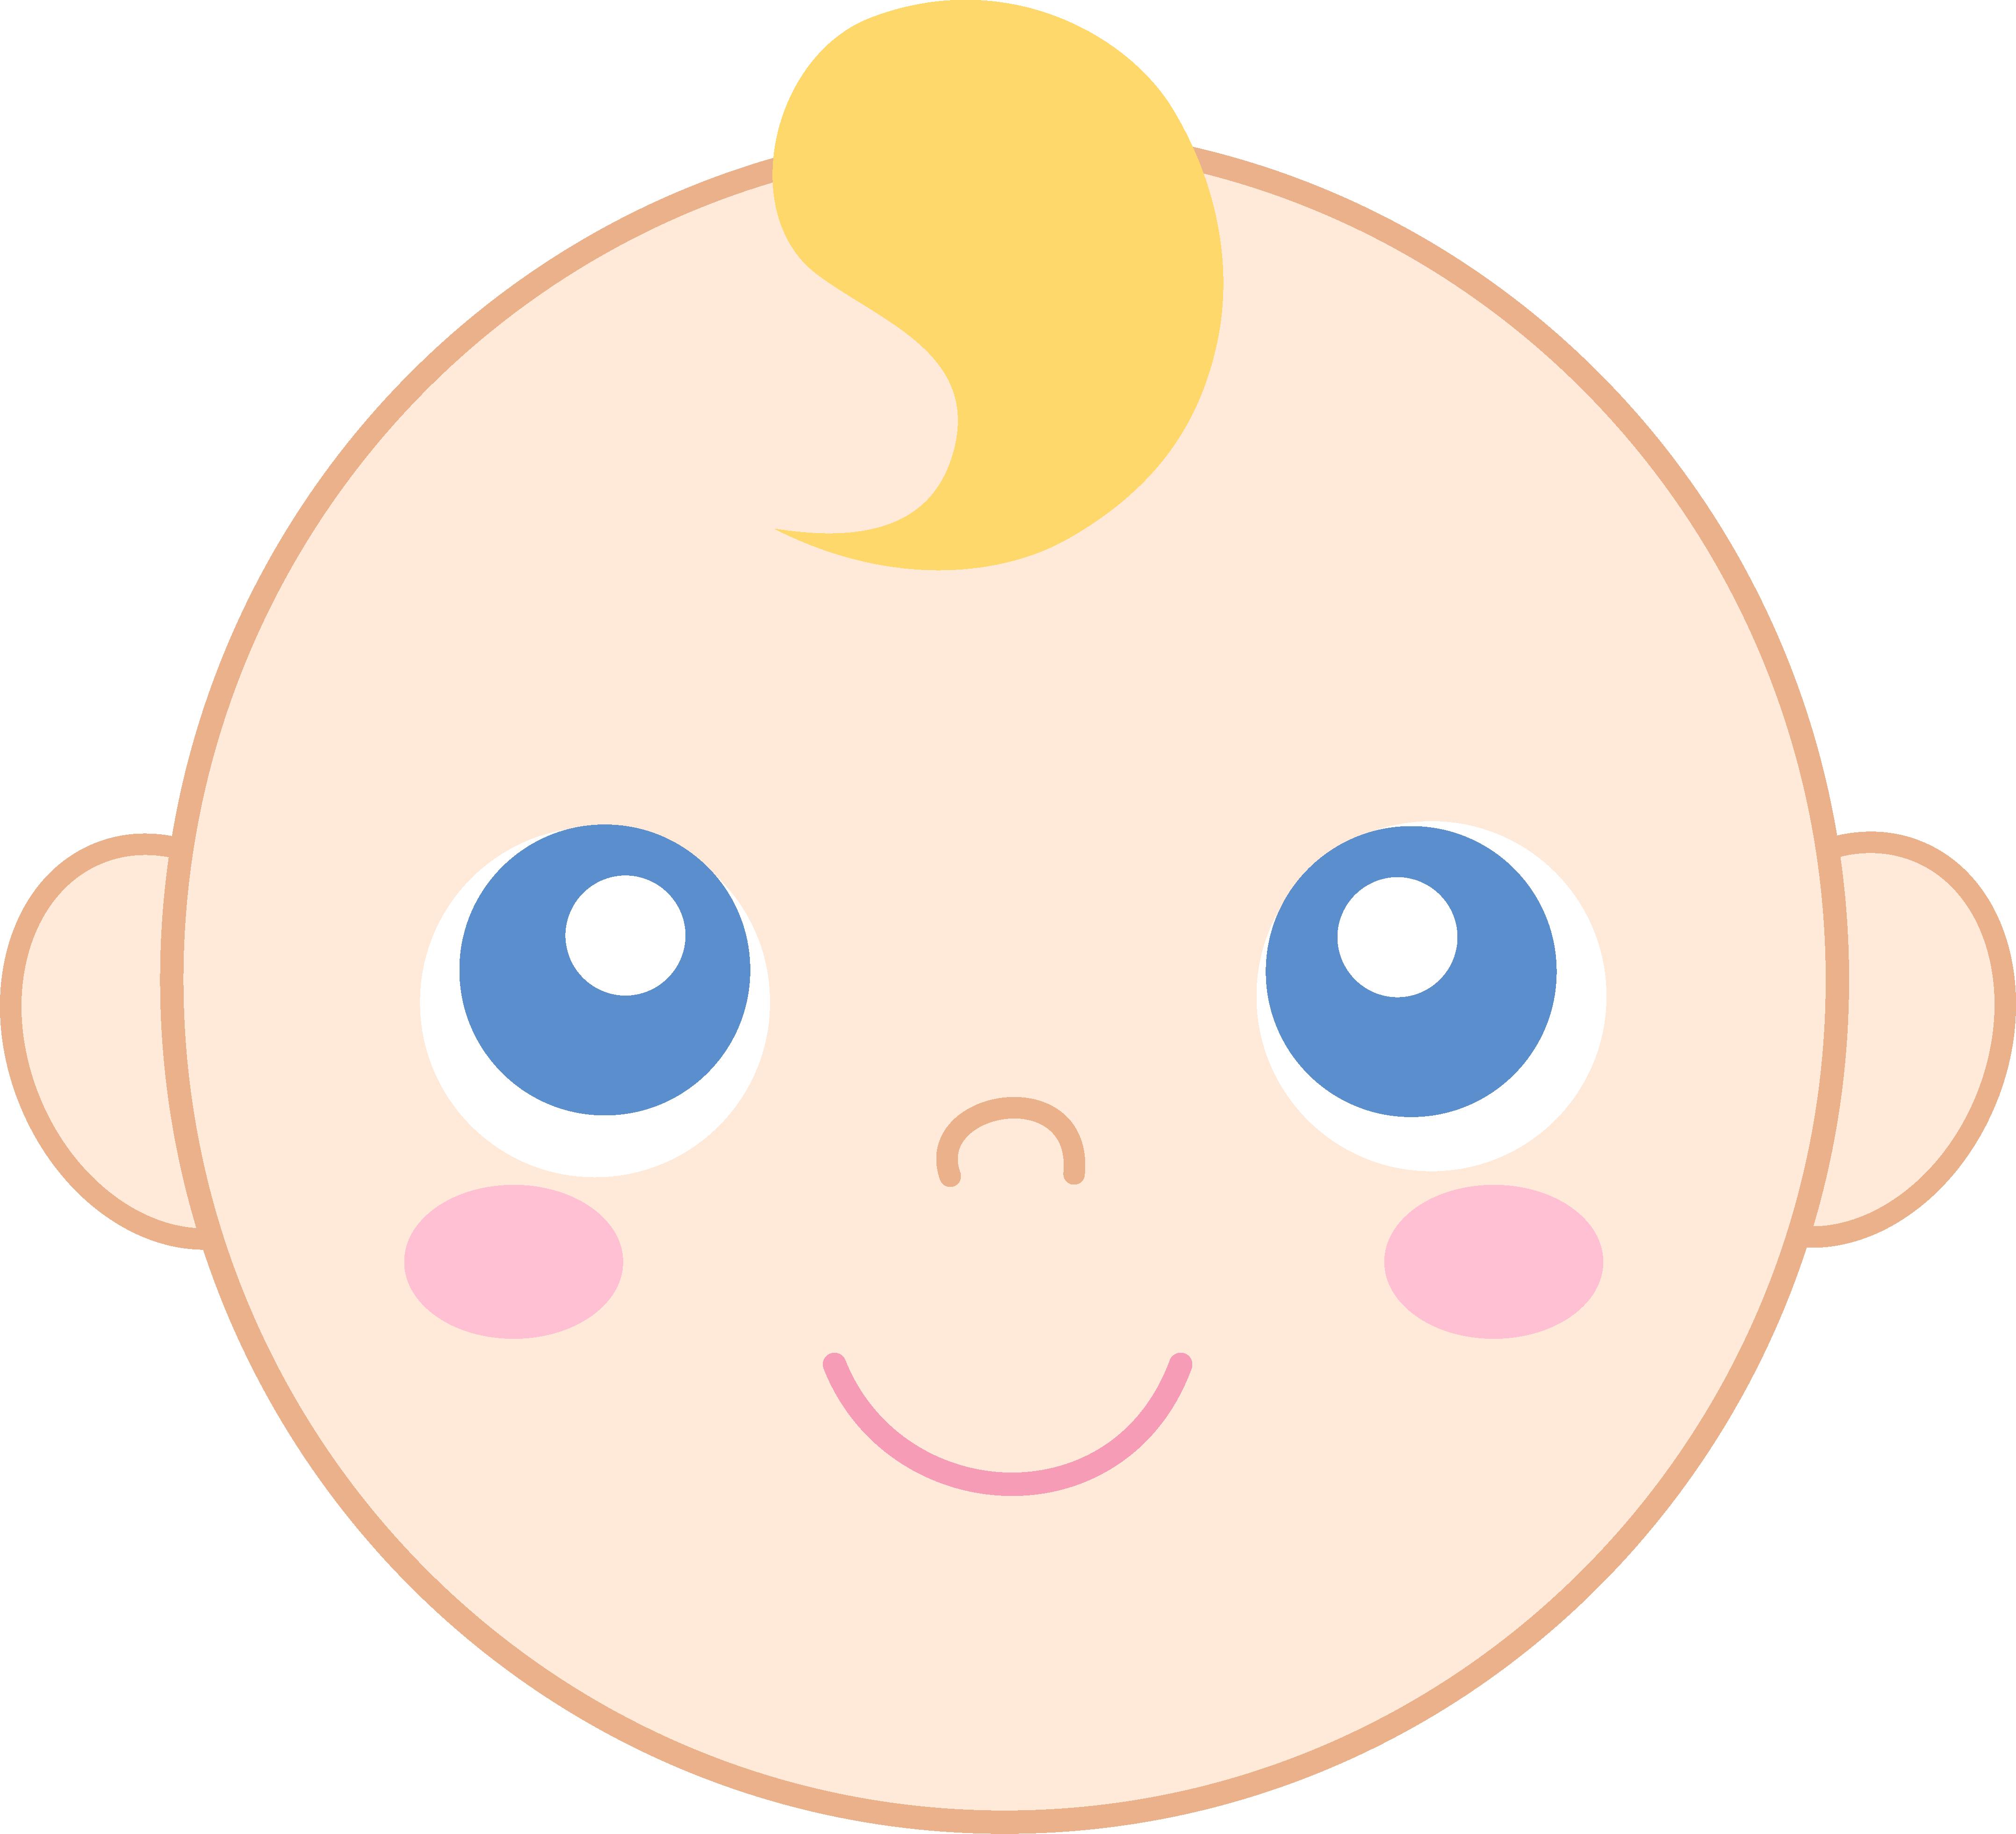 4312x3922 Cute Baby Face Clipart